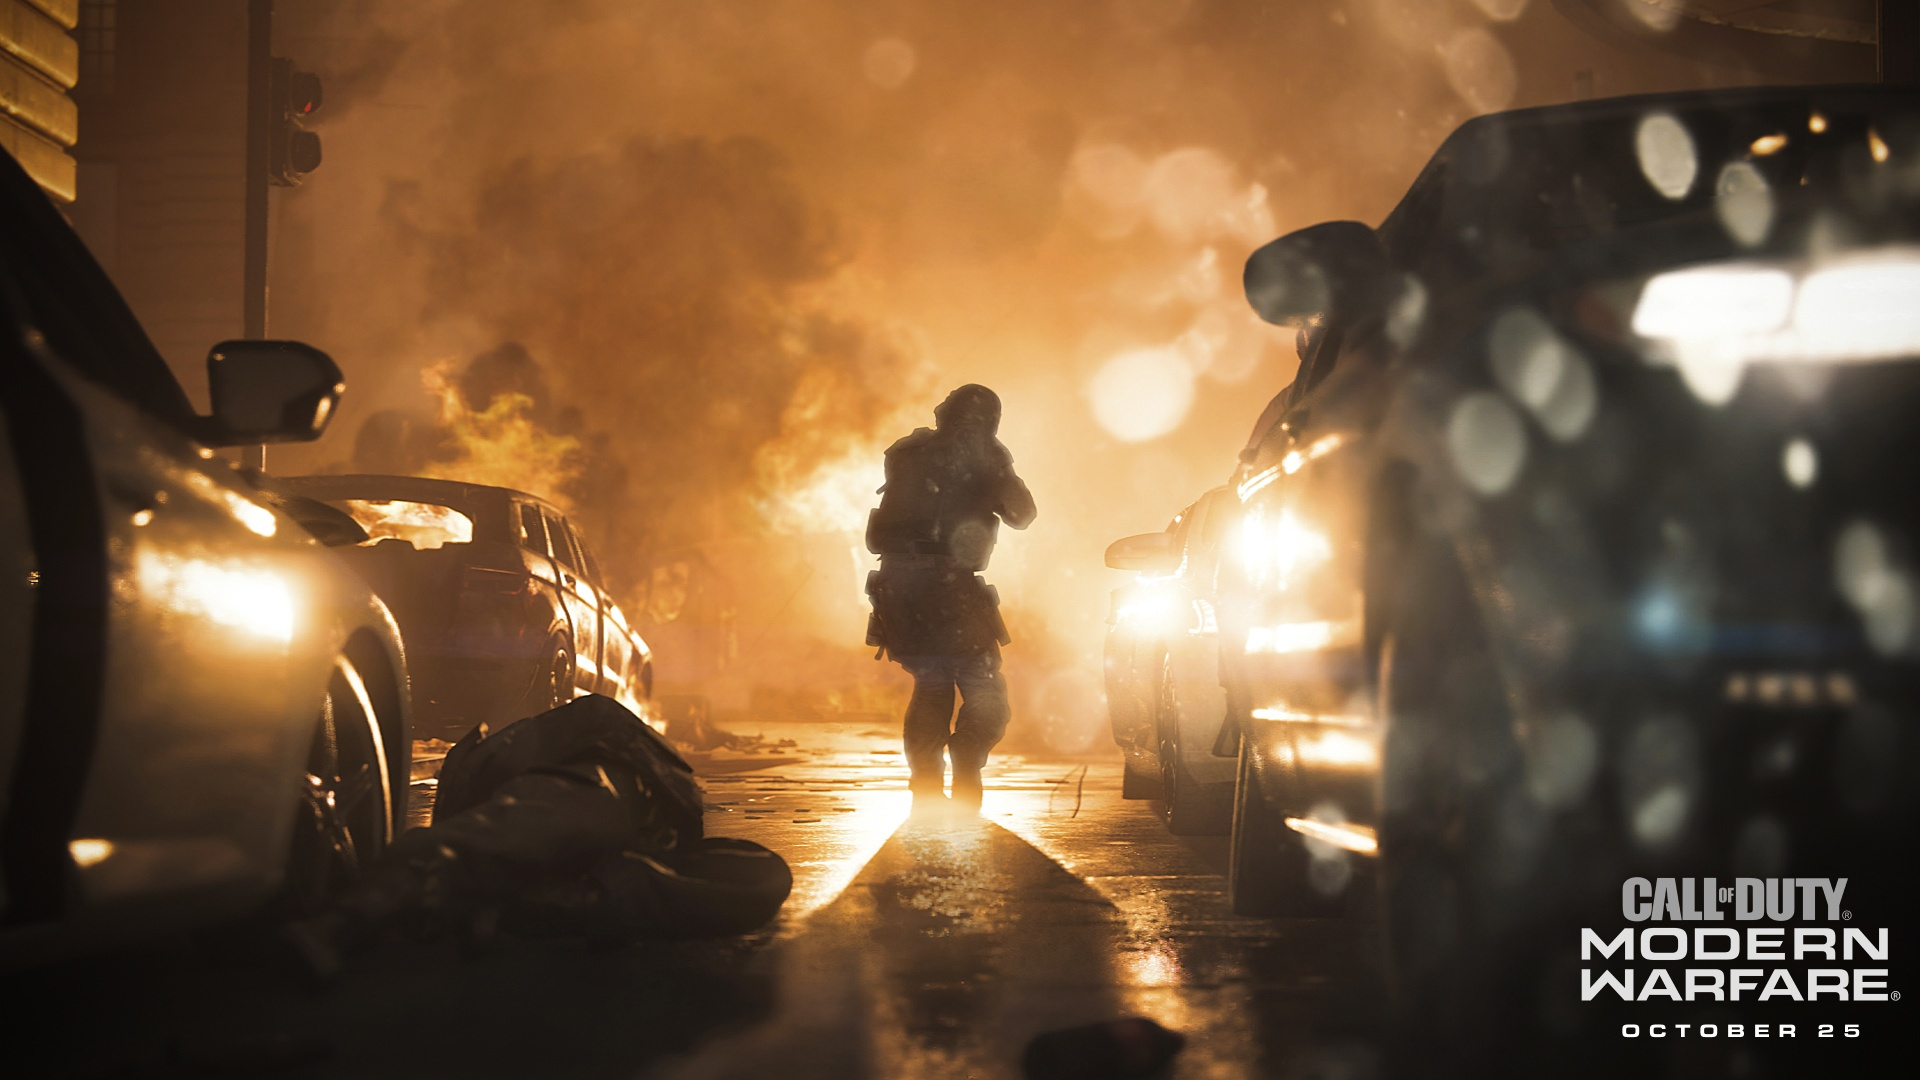 Captura de tela de Call of Duty: Modern Warfare